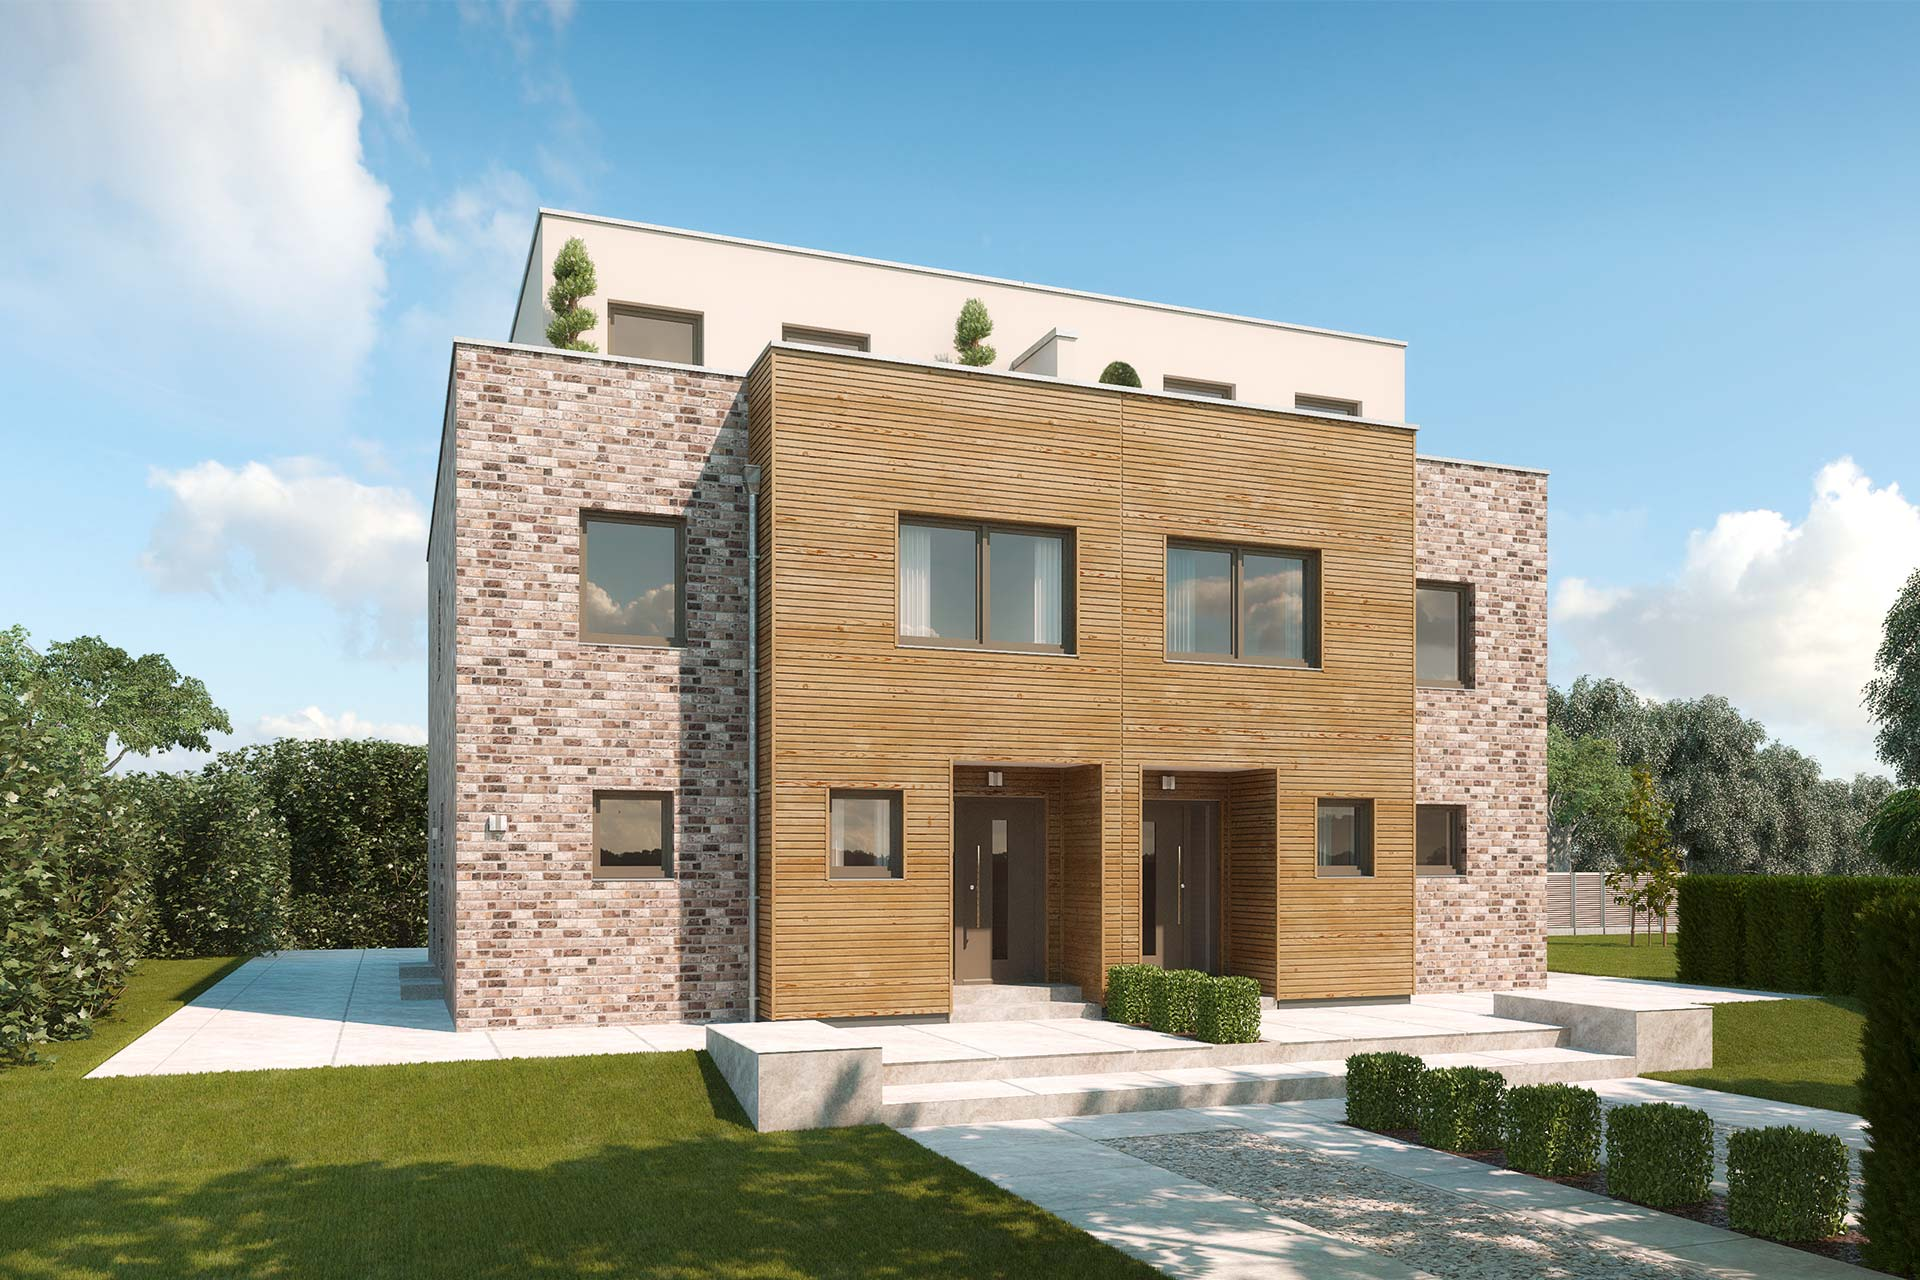 Doppelhaus mit 3 etagen penthouse etage mit for Modernes haus 2 etagen